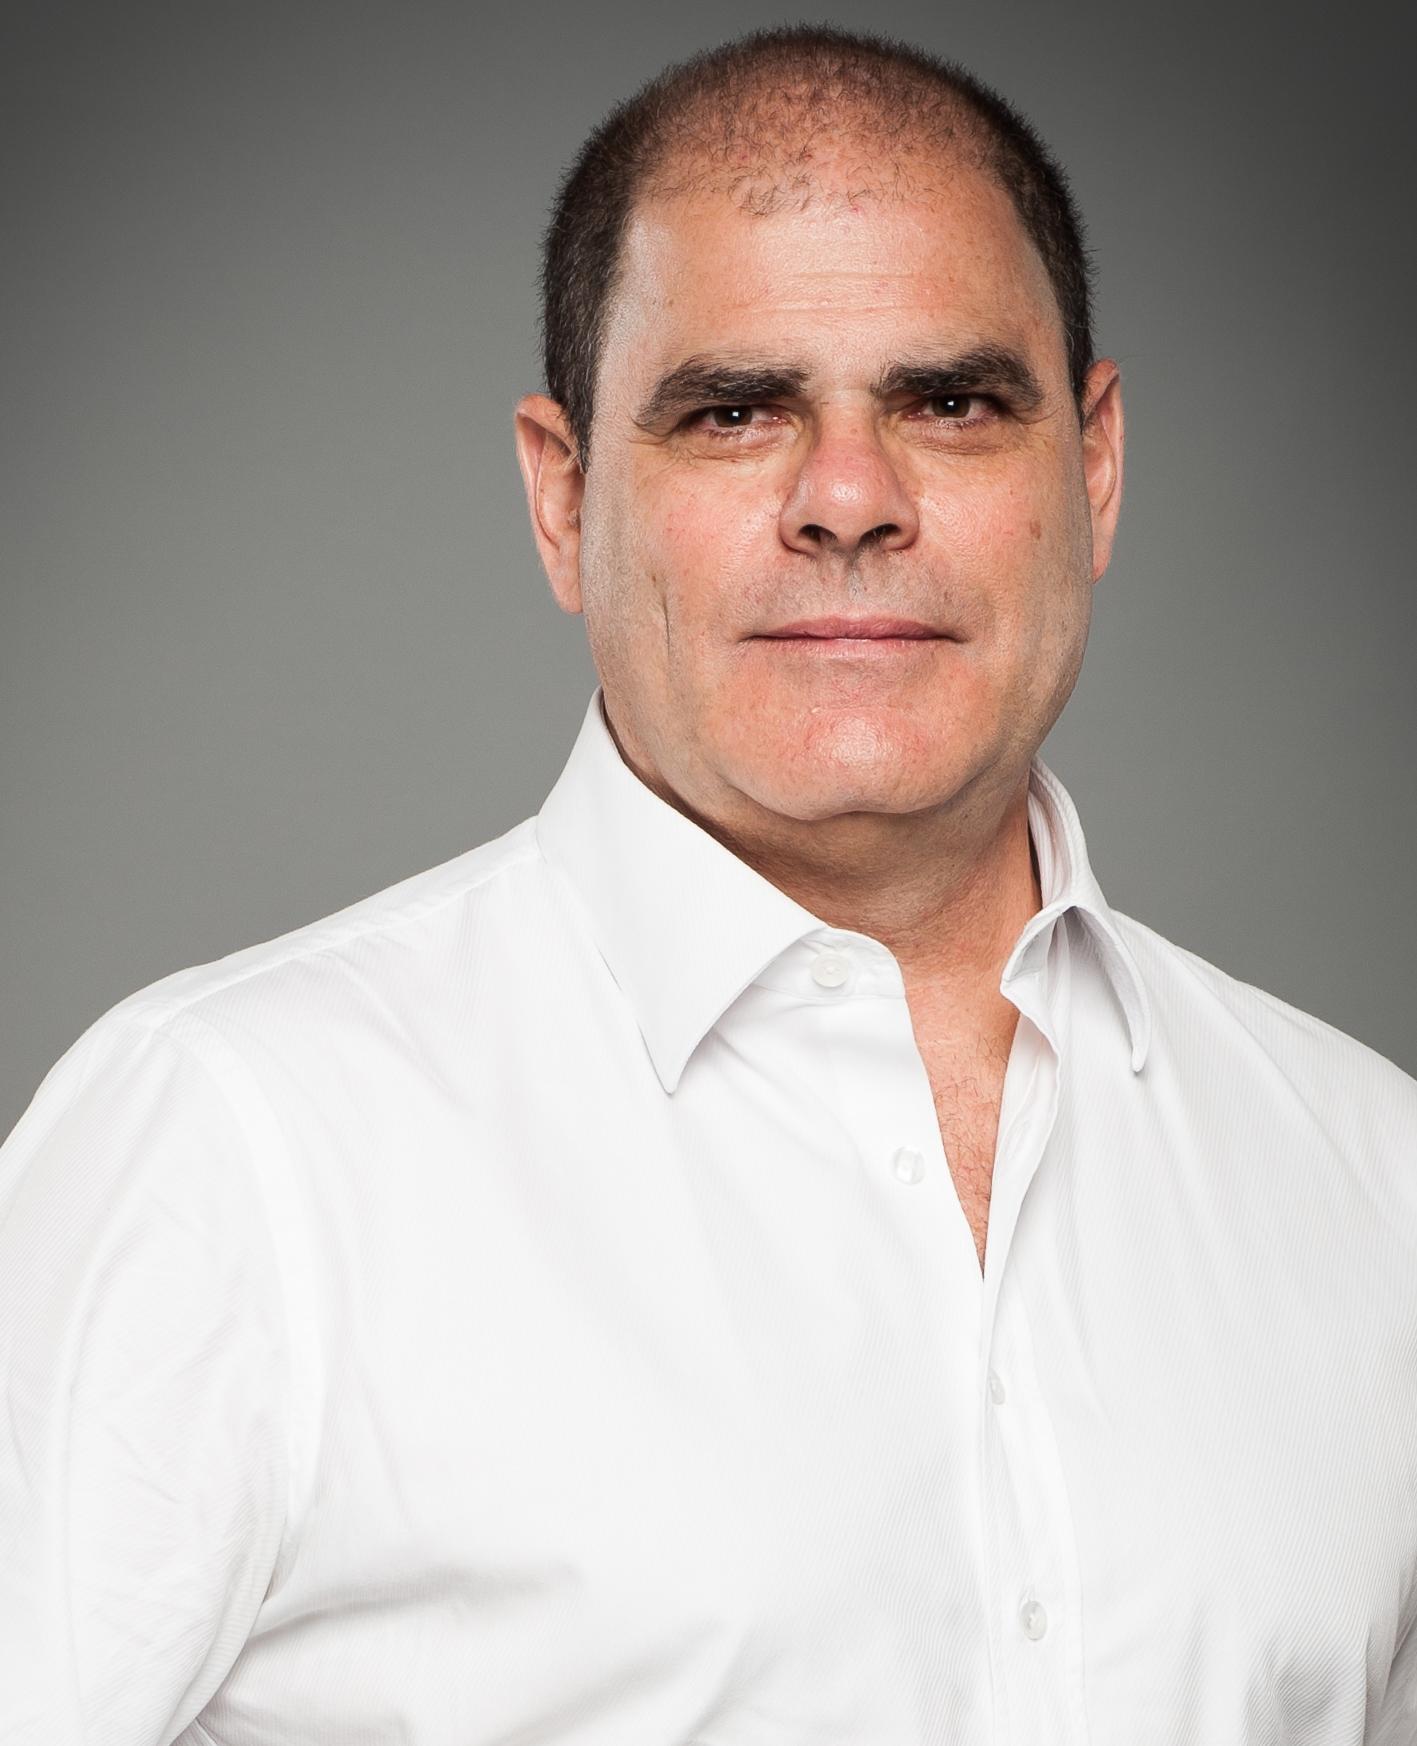 Antonio Toledano